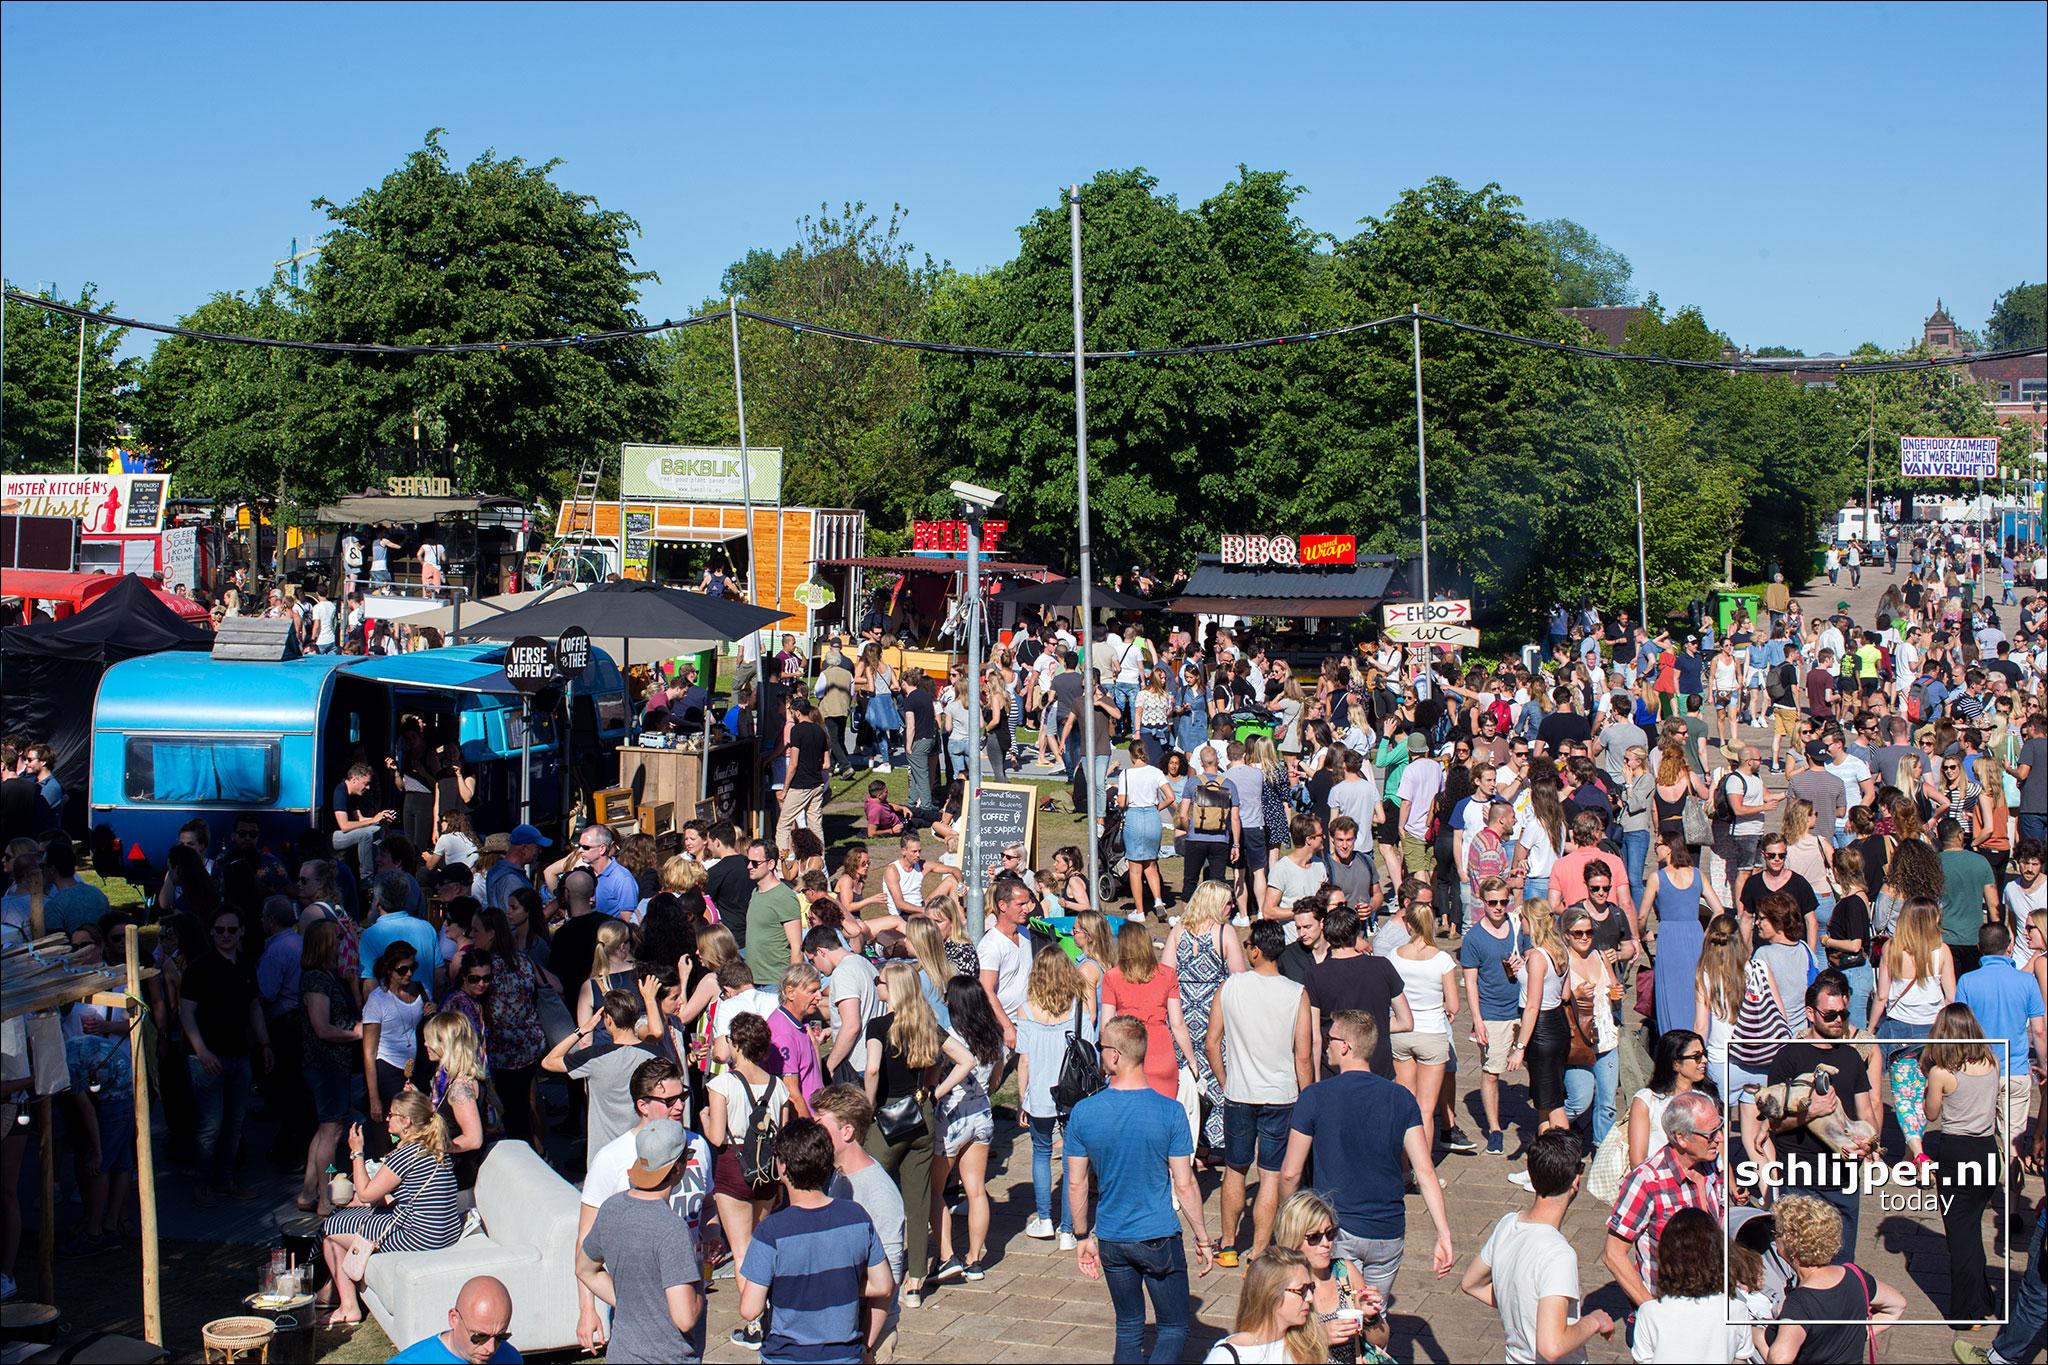 Rollende Keukens Amsterdam : Schlijper.nl today thu may 25 2017 17:25 img 2388 westerpark